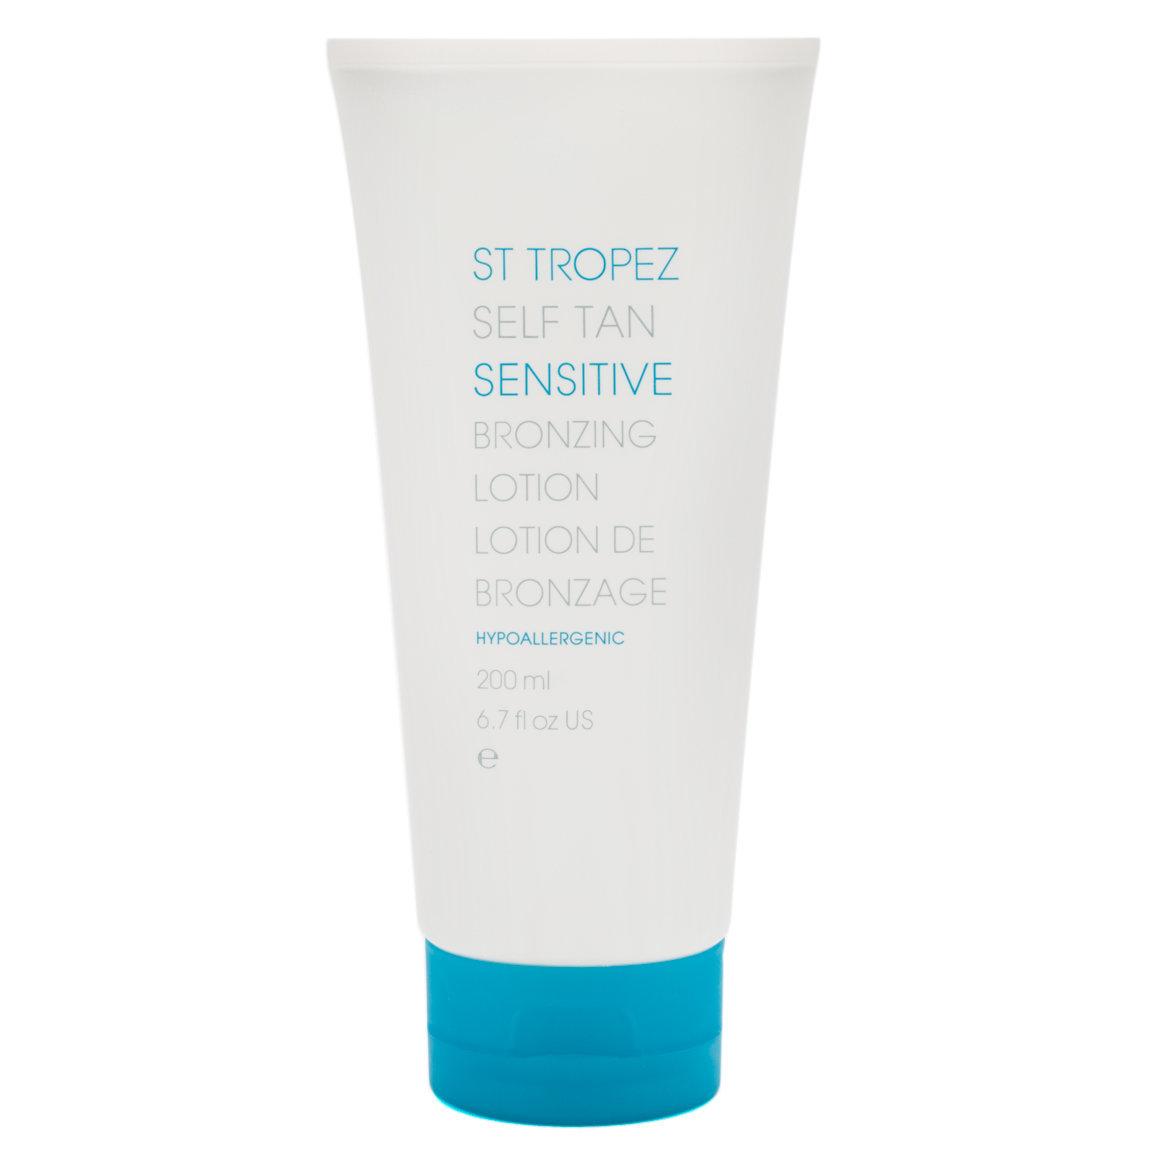 St. Tropez Self Tan Sensitive Bronzing Lotion alternative view 1 - product swatch.